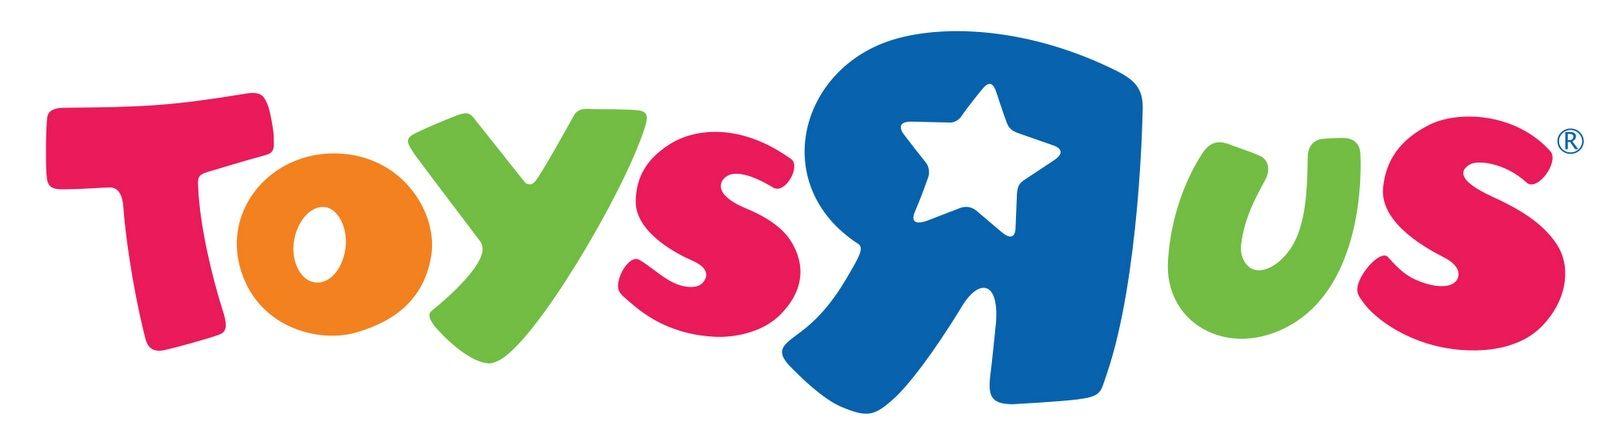 "Toys""R""Us | トイザらス, ロゴ, ロゴマーク"